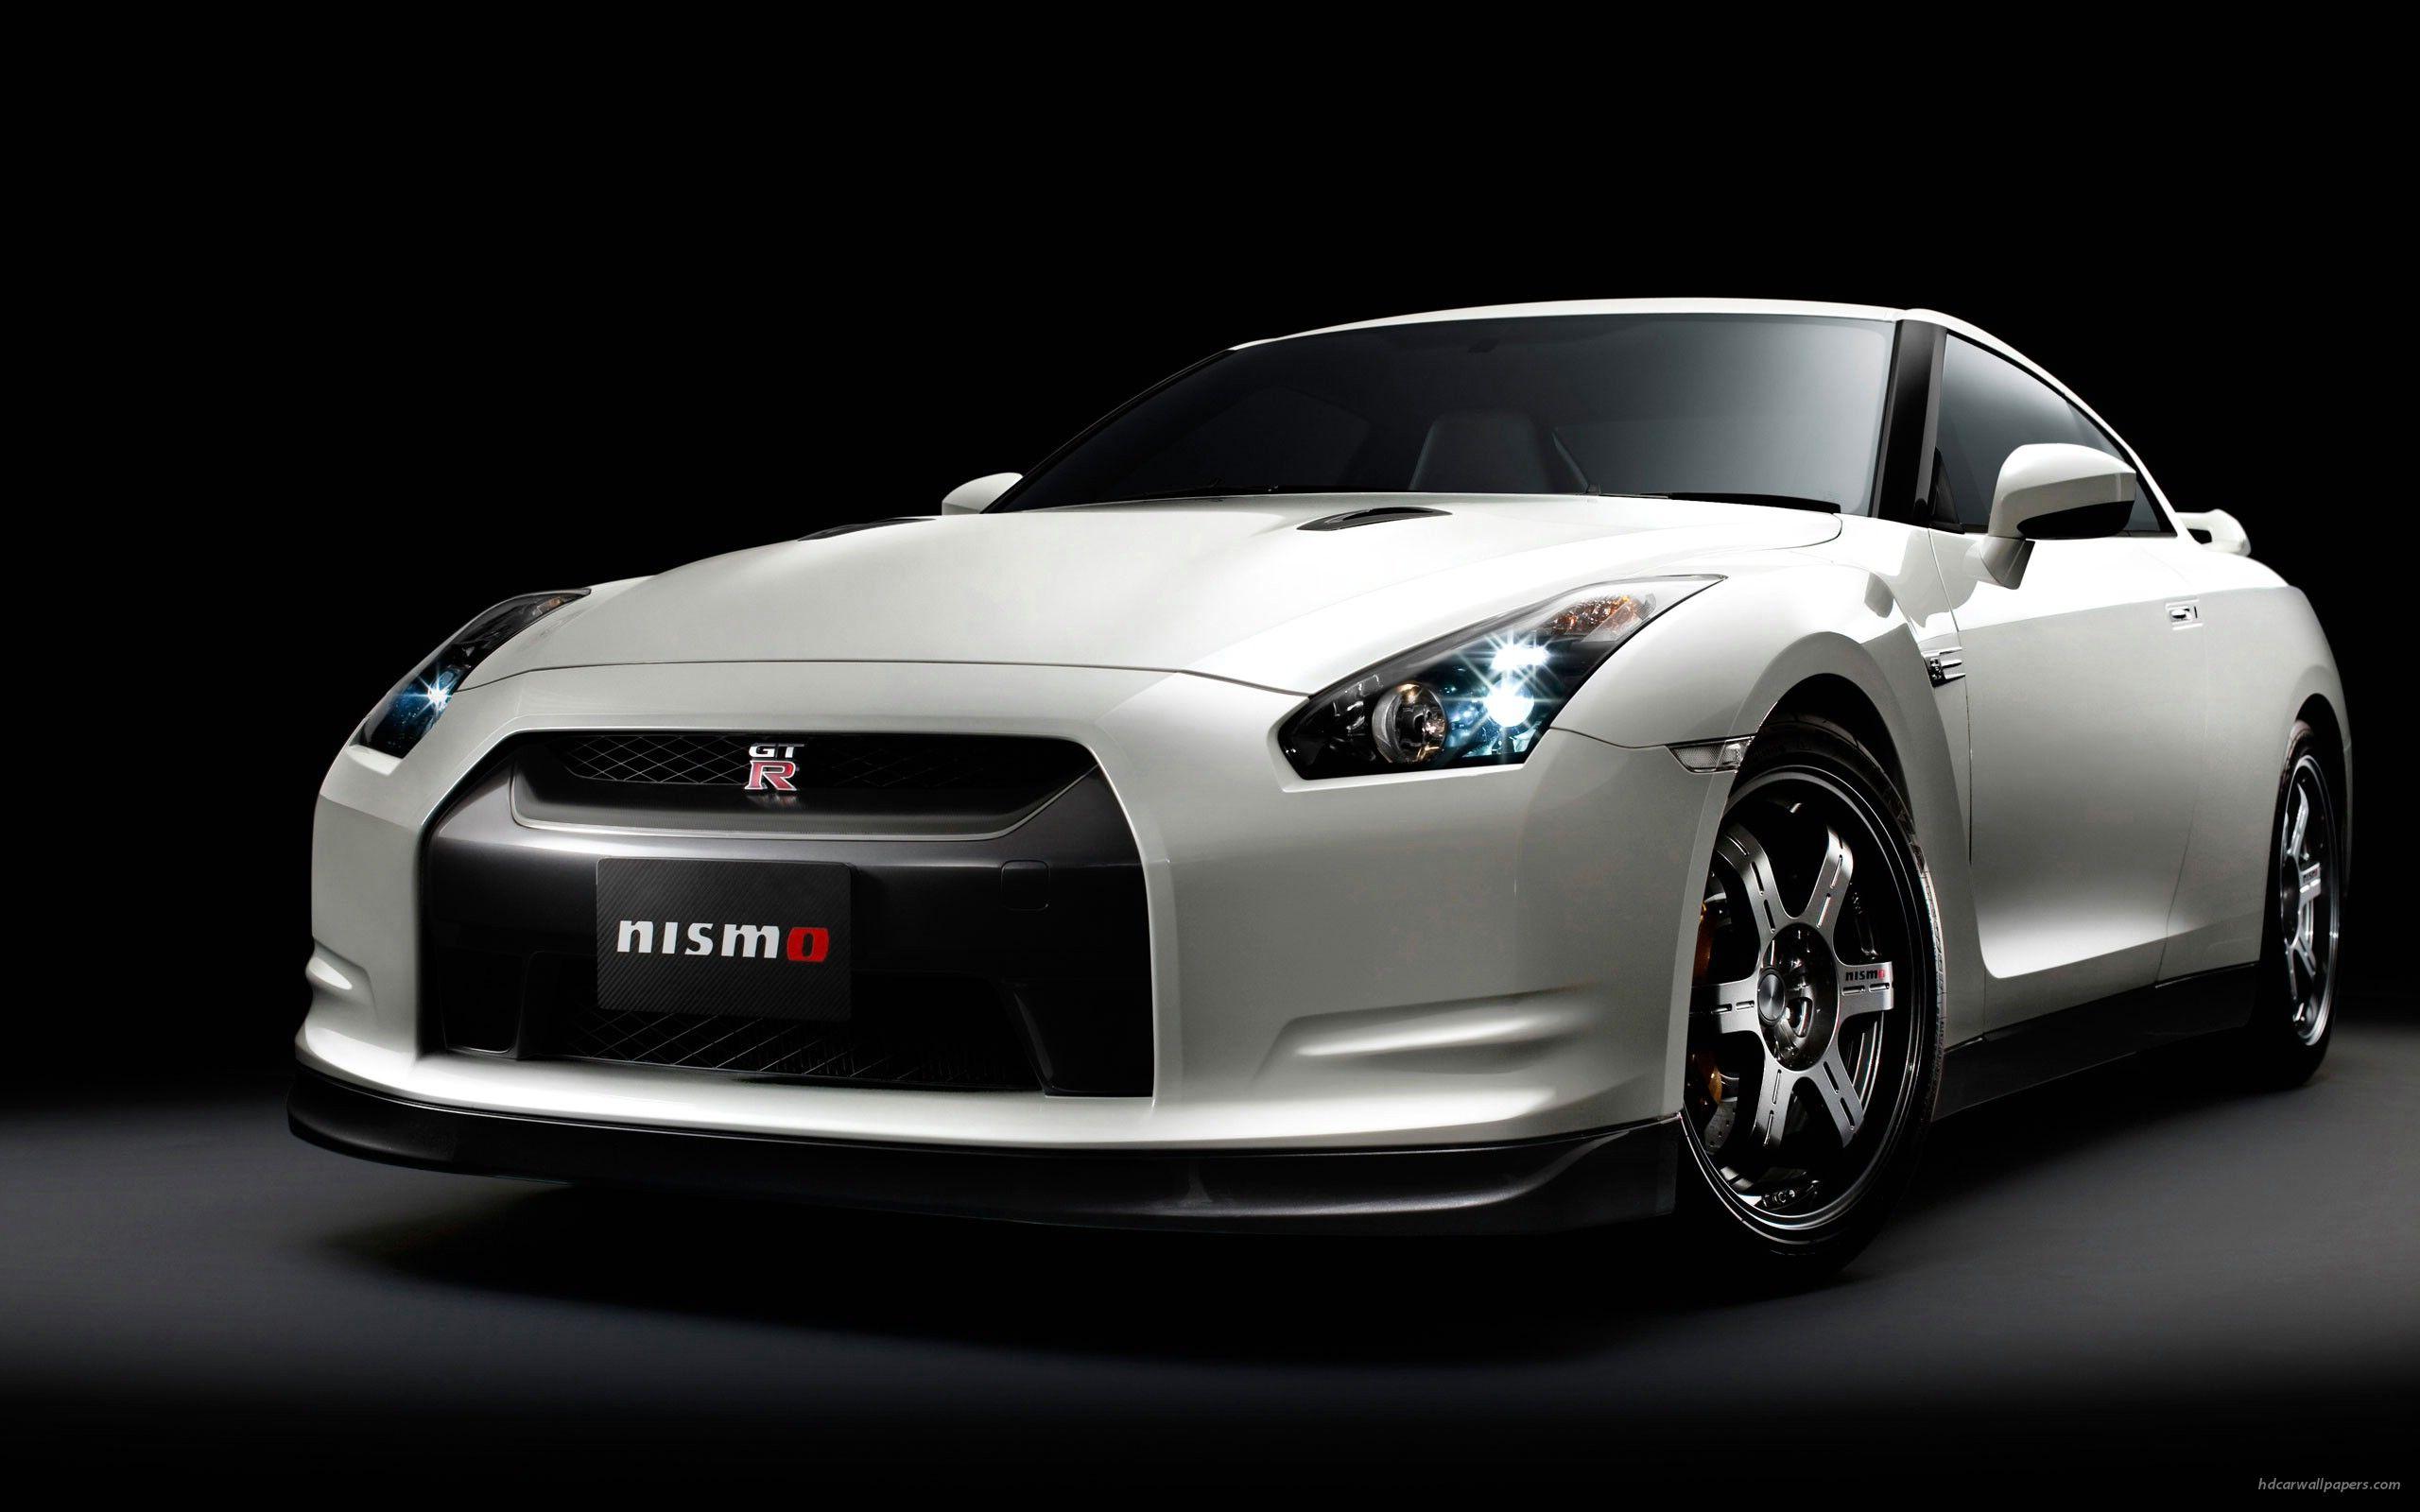 Nissan Skyline Gtr R Wallpaper × Nissan Skyline GTR R